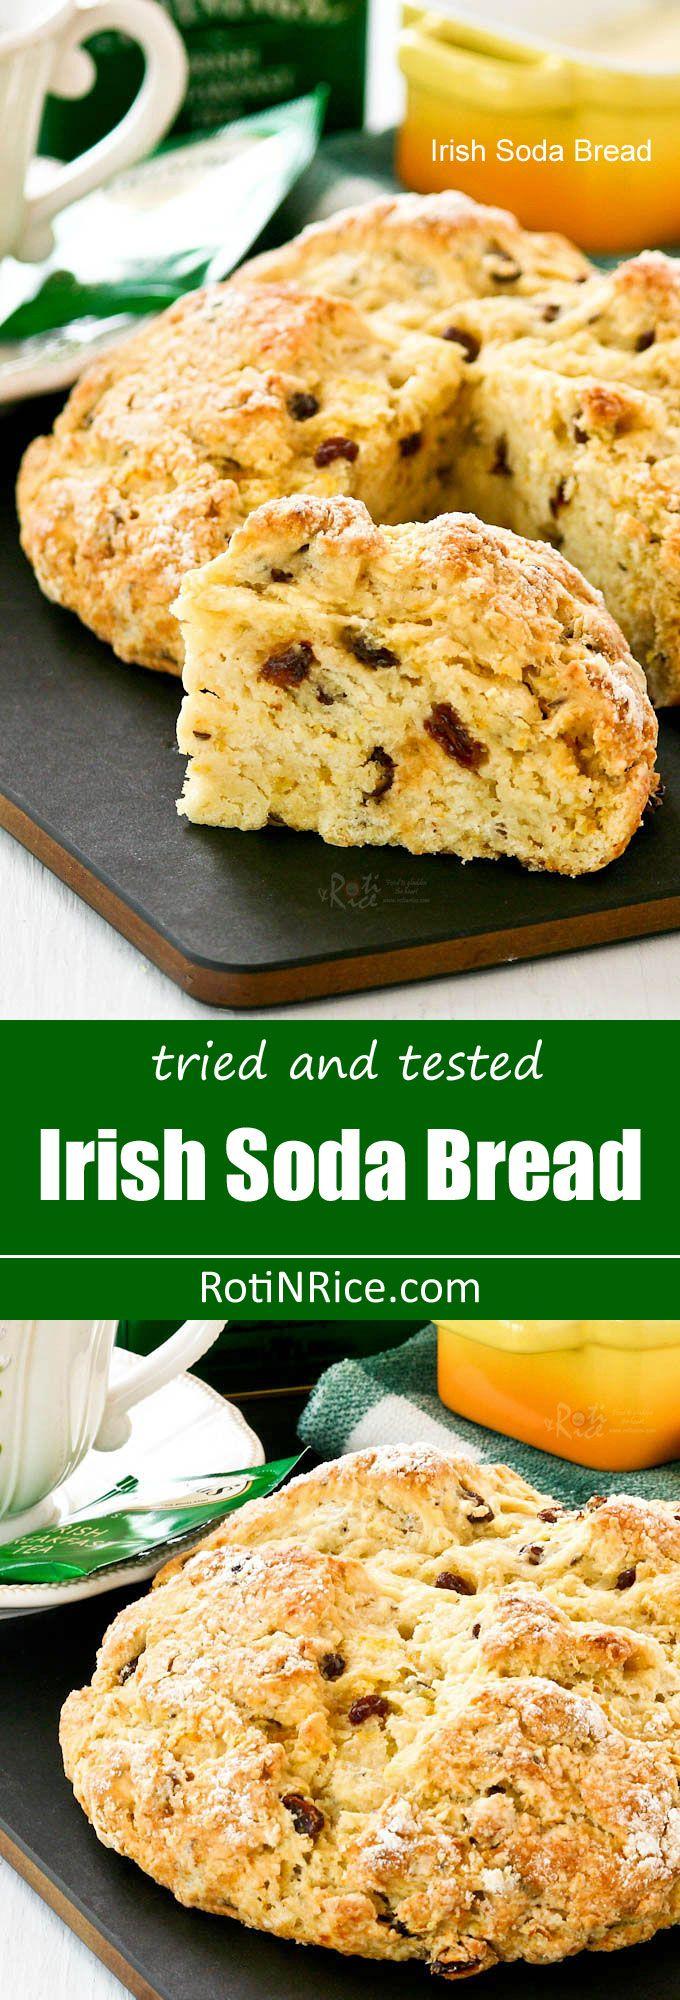 Irish Soda Bread flavored with caraway seeds, orange zest, and raisins ...